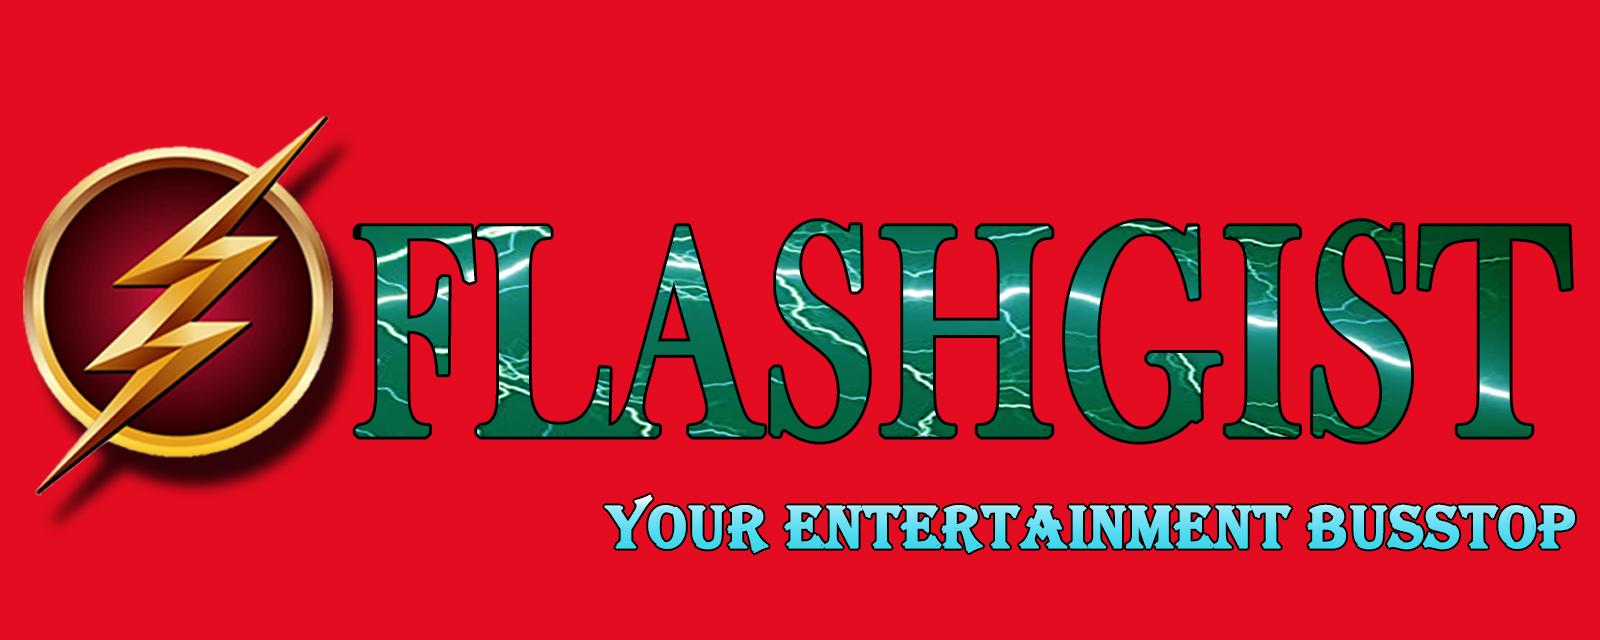 Flashgist